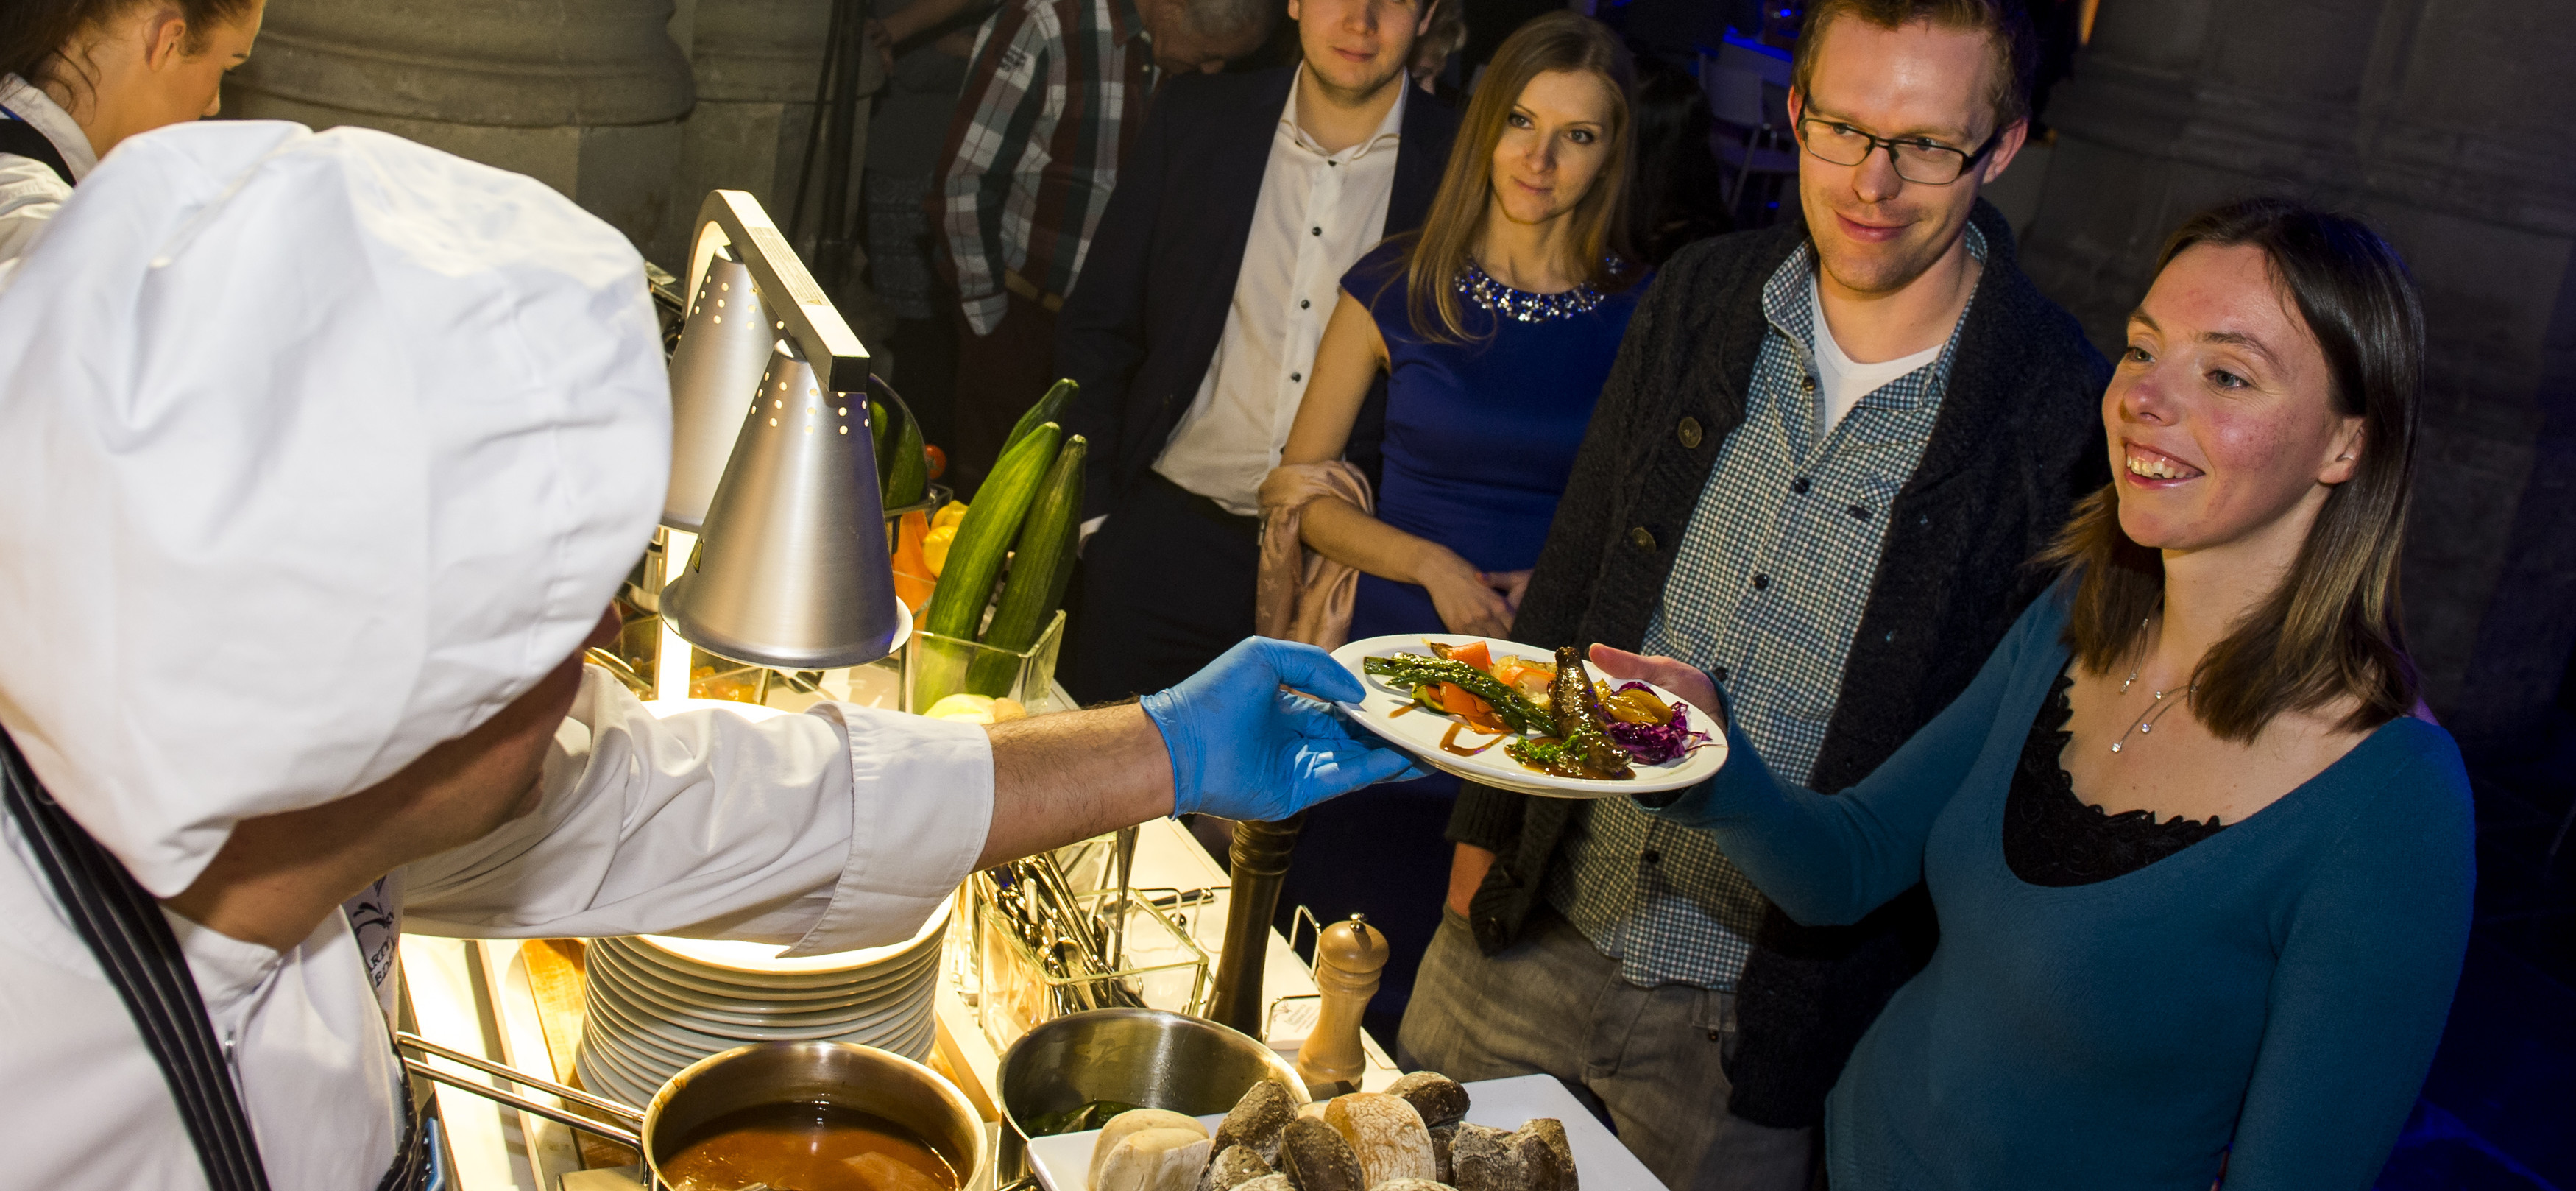 Feest Wintershall, Partyservice, 7 februari 2015, Grote Kerk, Goes. Foto Marco De Swart